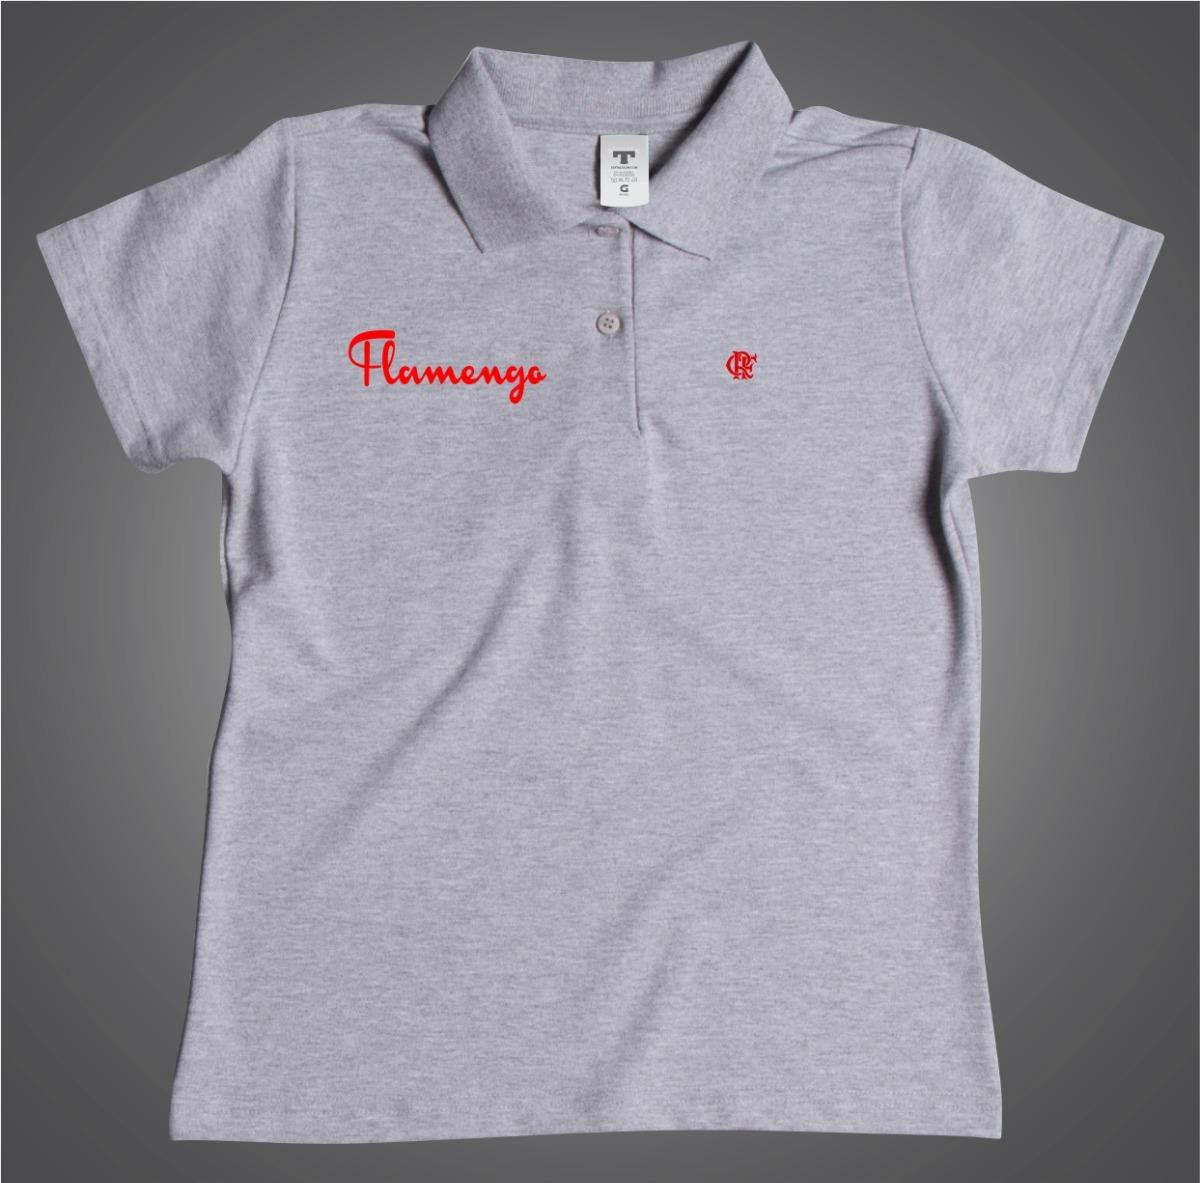 Camisa Polo Especial Flamengo Torcedora Feminina Baby Look - R  54 ... 6d77936db6ee7